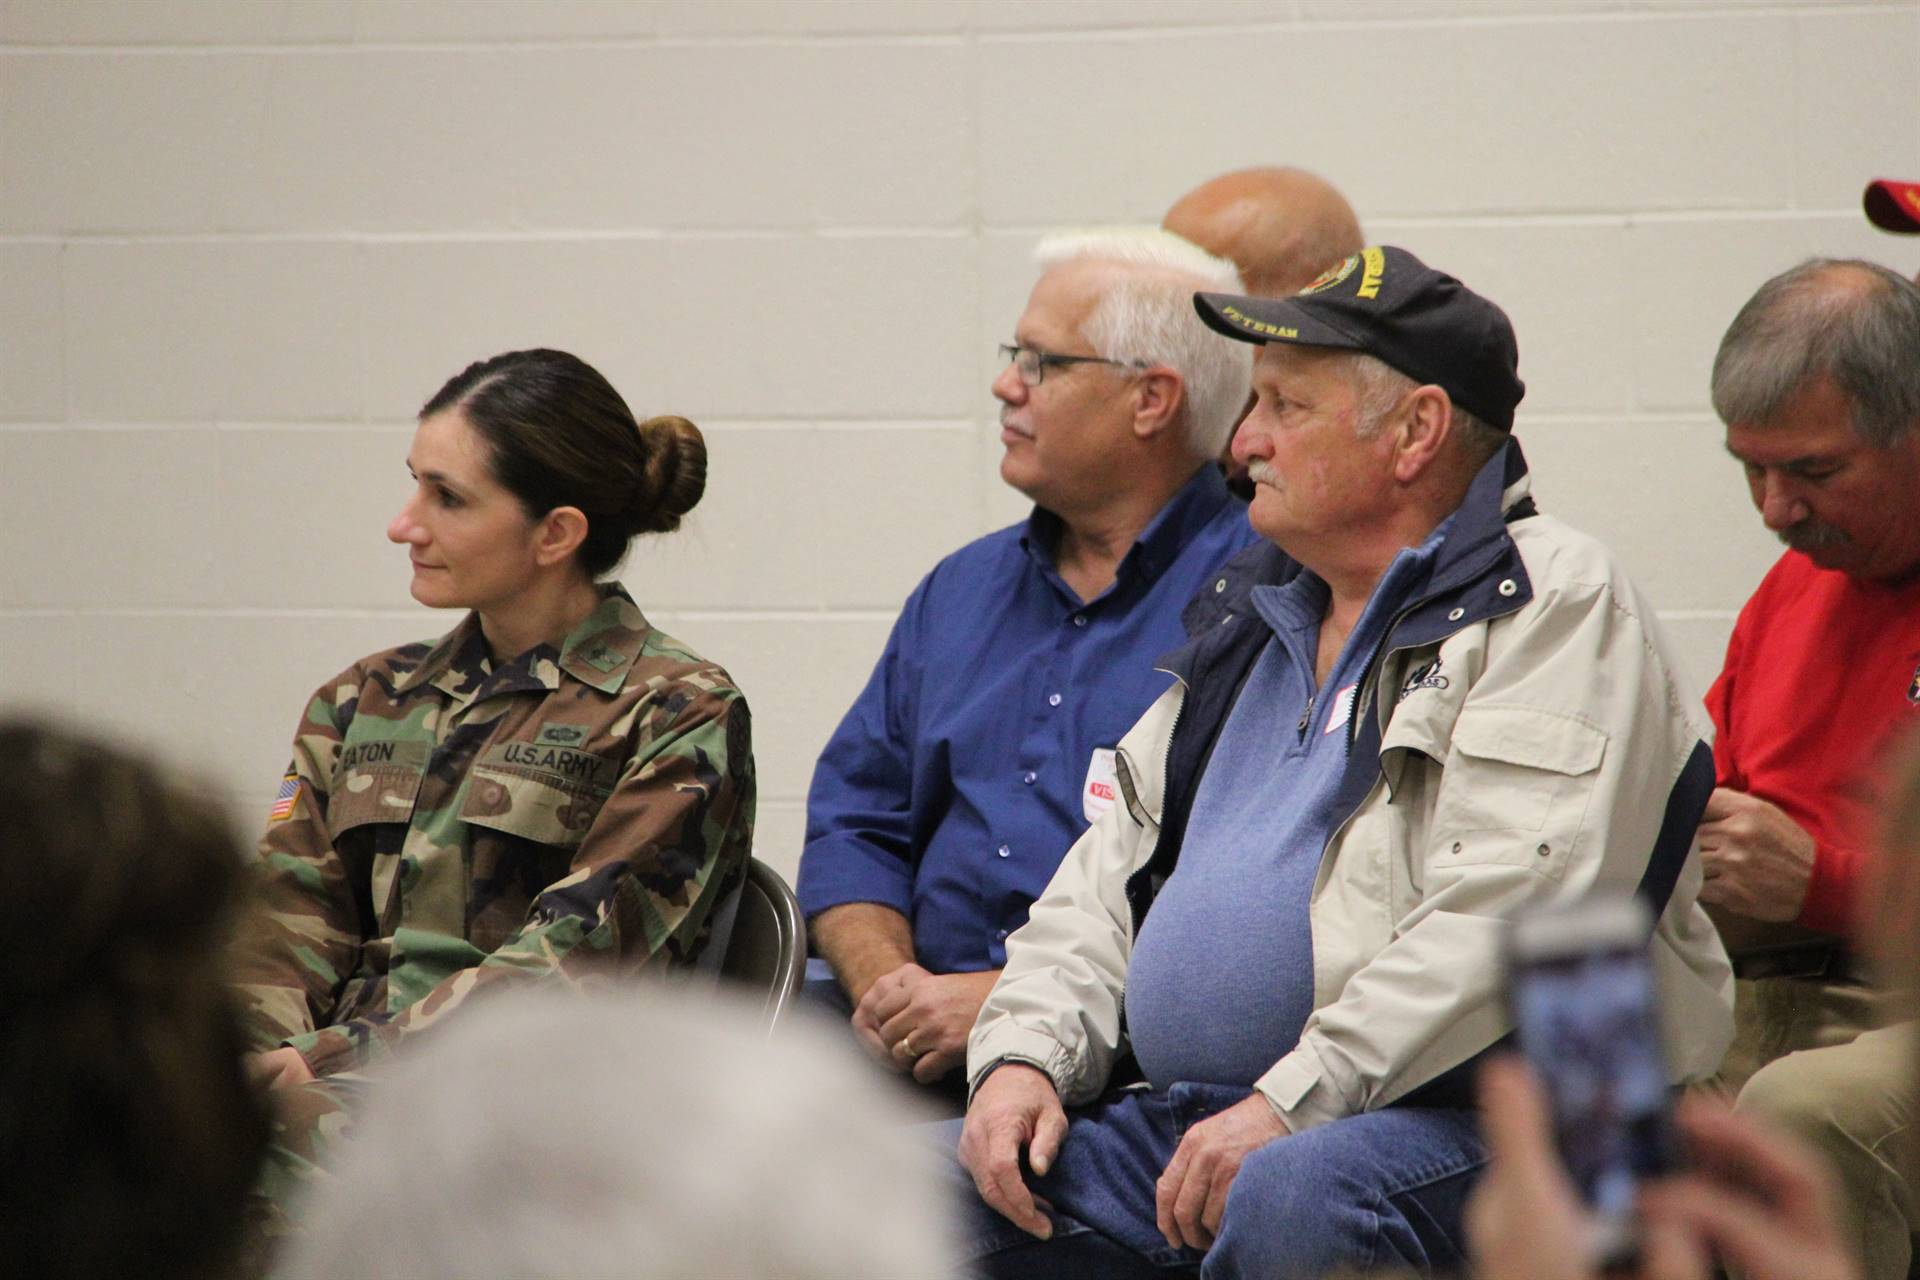 veterans listening to students read patriotic poems